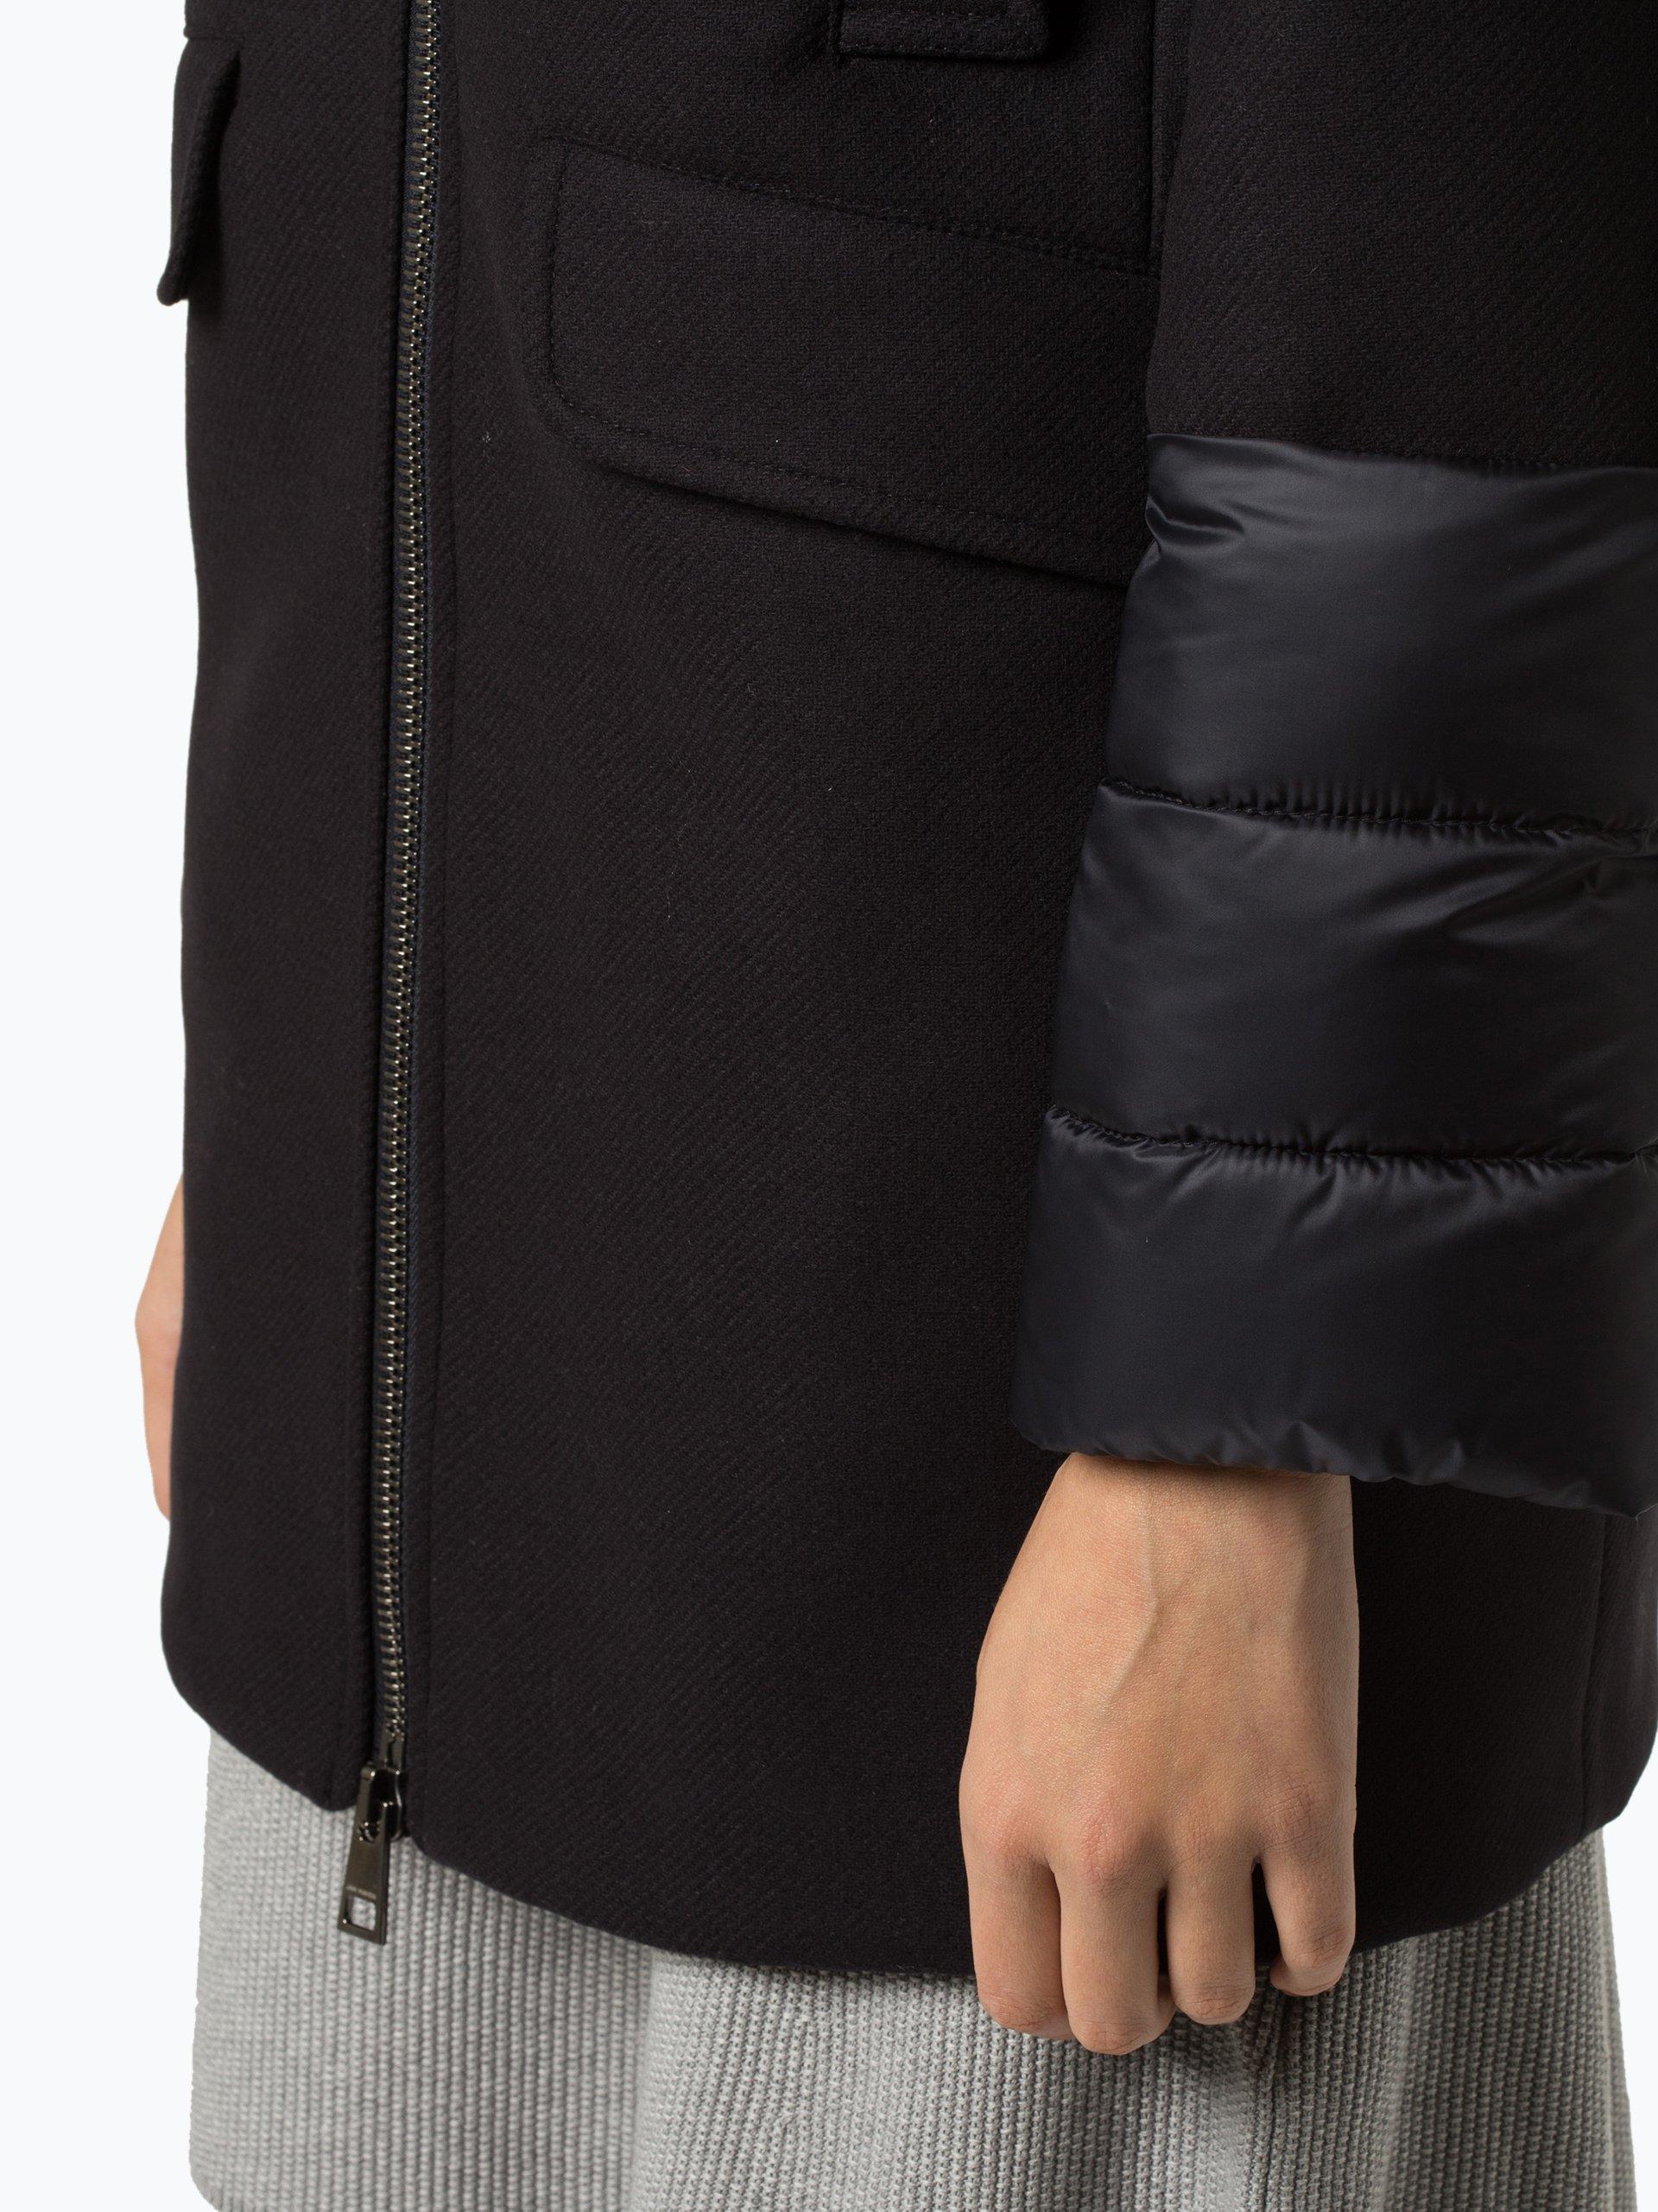 jan mayen damen mantel mit cashmere anteil salice online kaufen vangraaf com. Black Bedroom Furniture Sets. Home Design Ideas